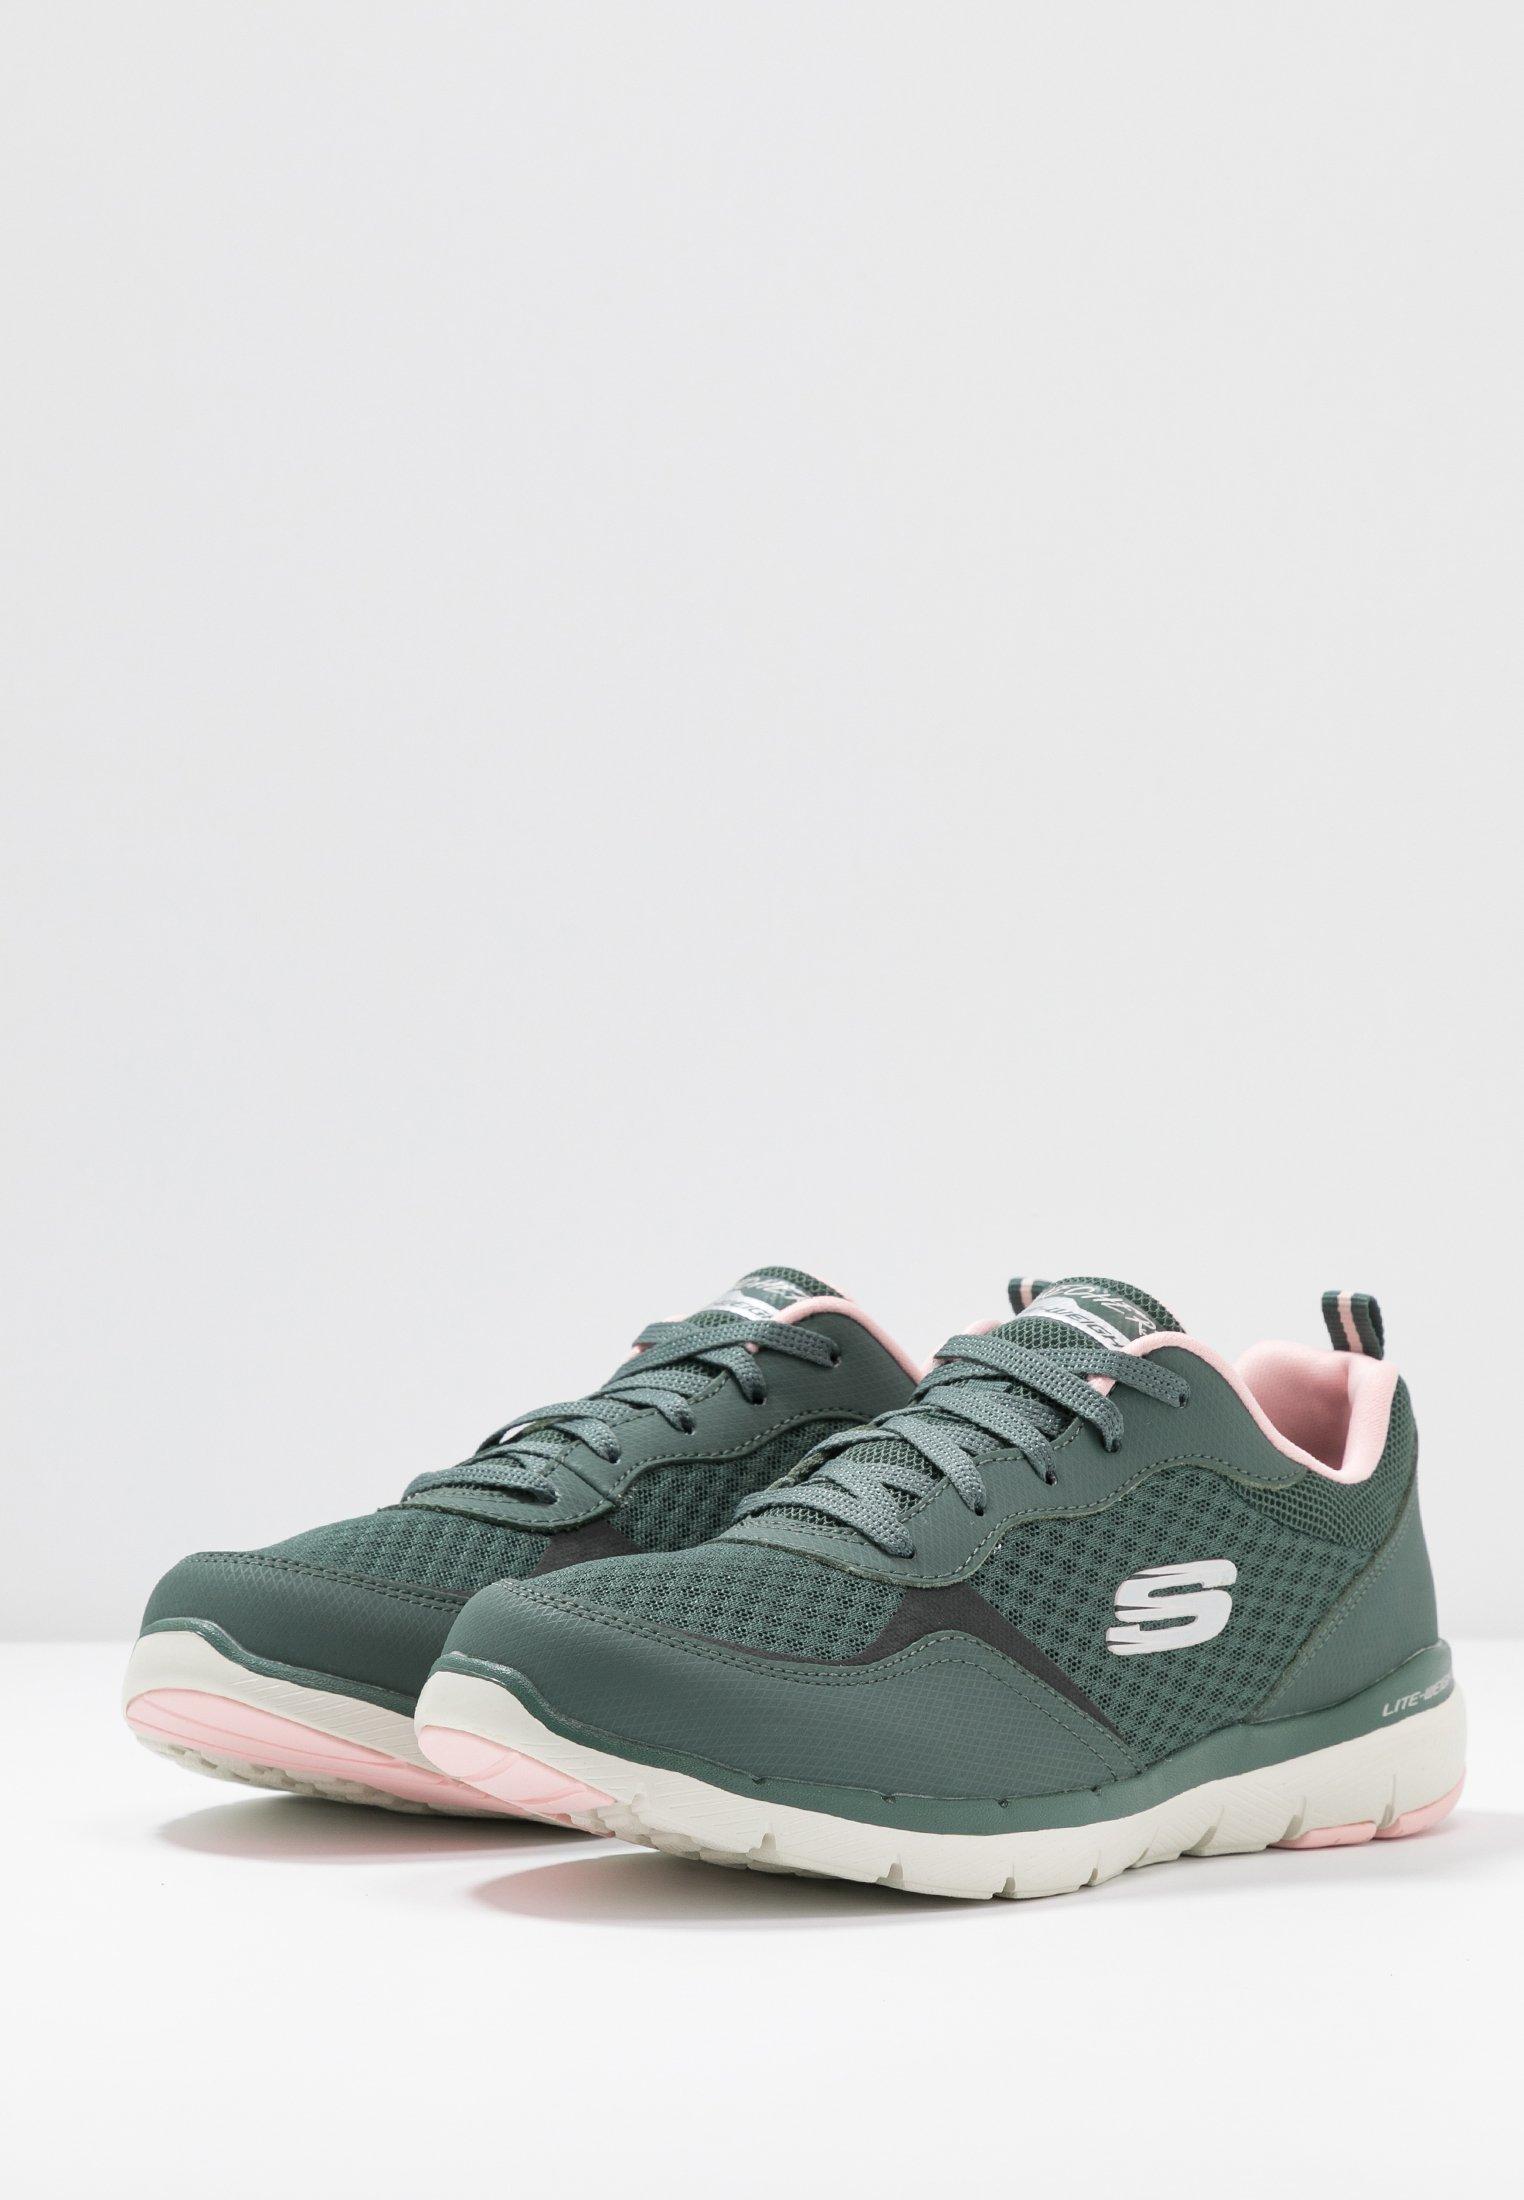 FLEX APPEAL 3.0 Sneakers olivepink